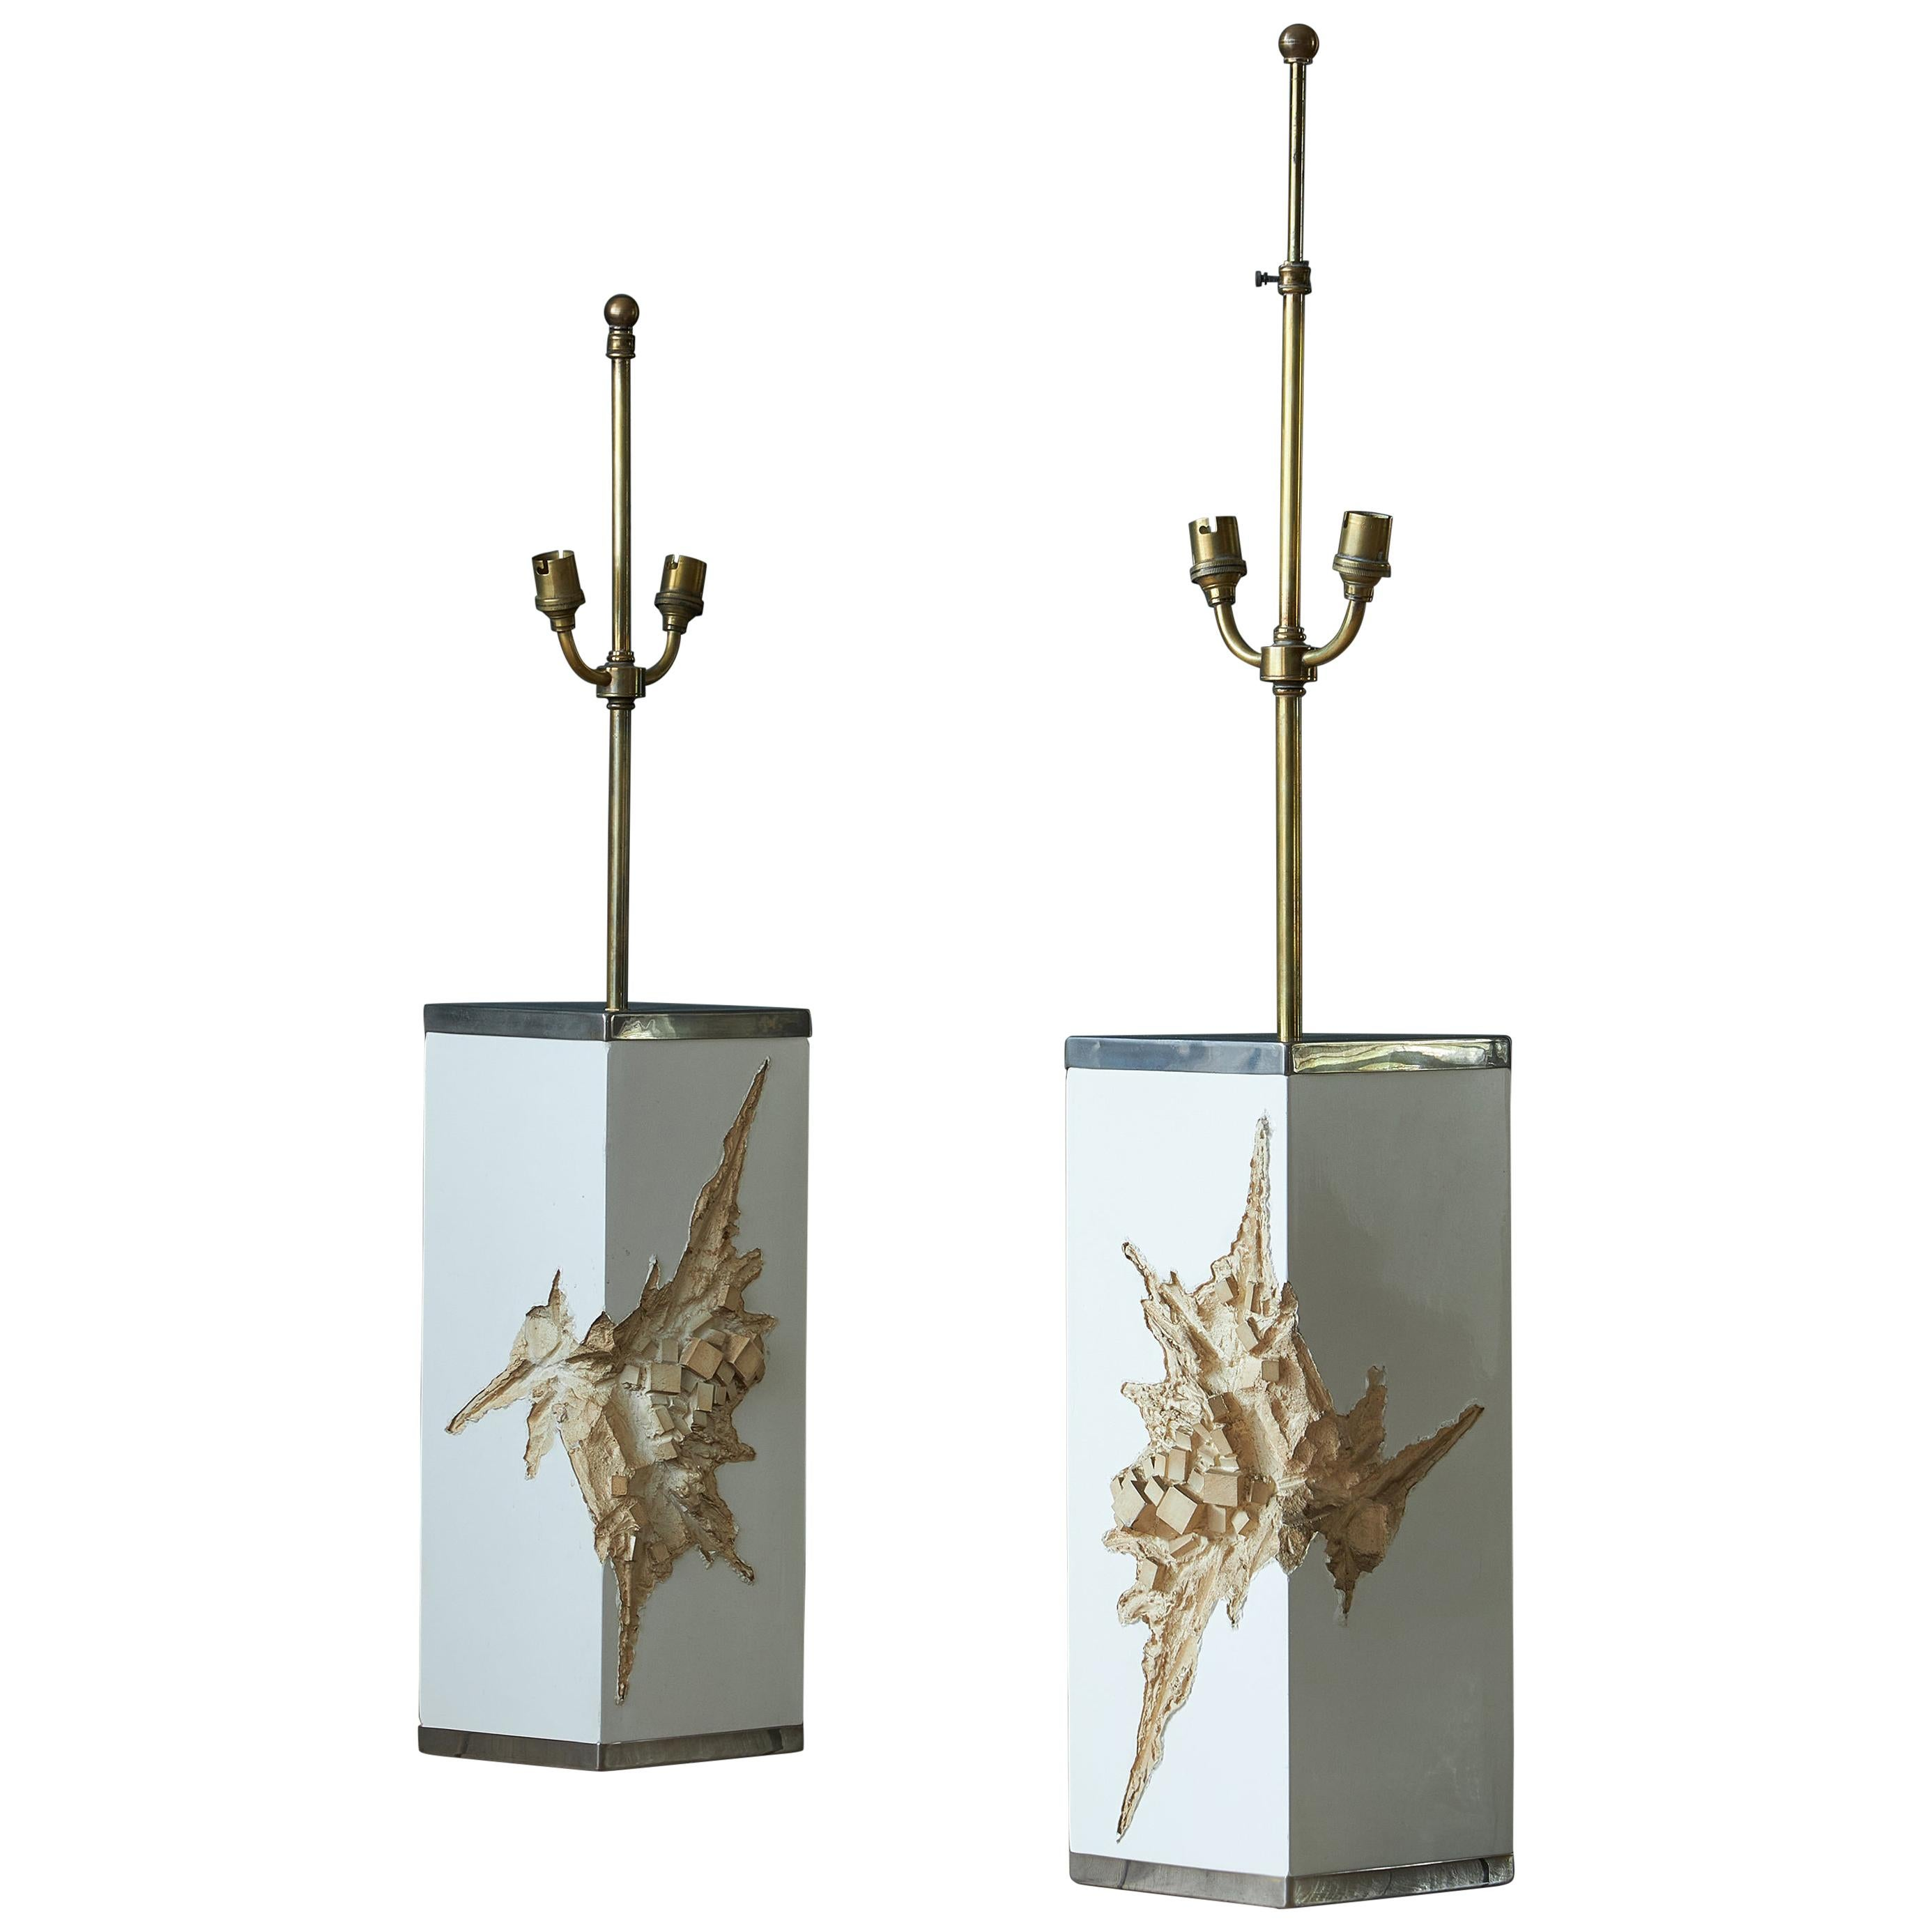 Pair of Brutalist Lamps